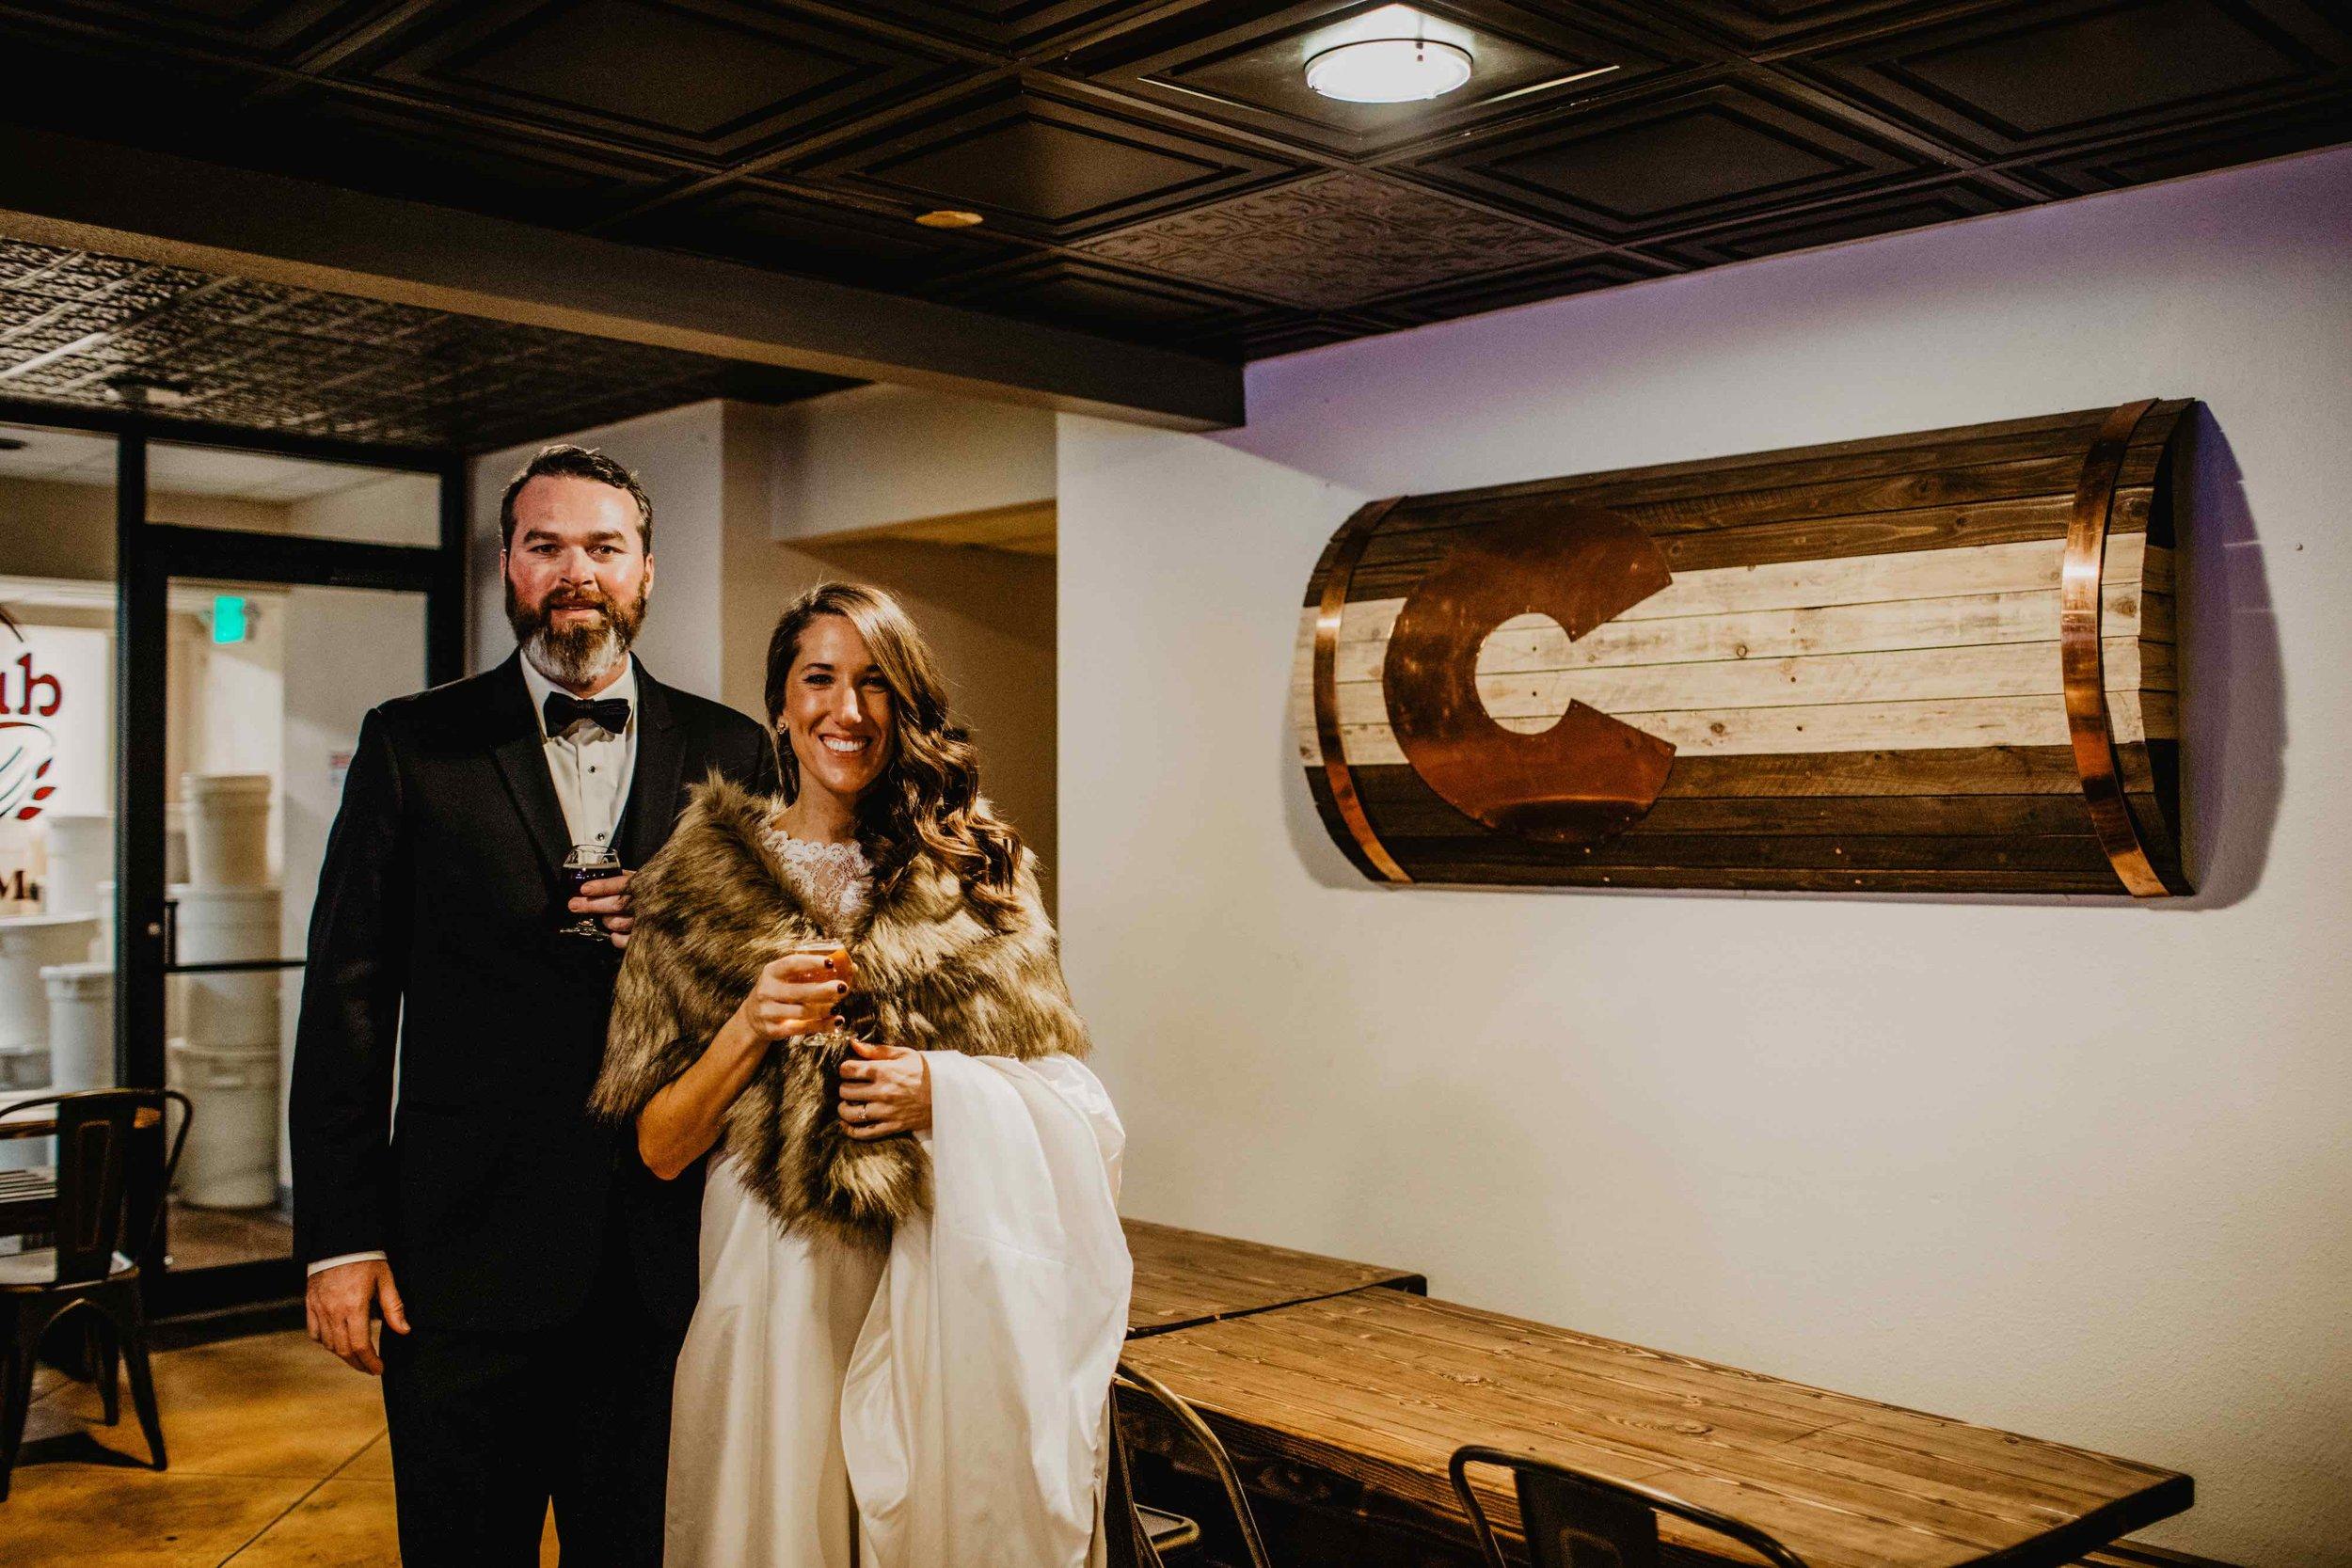 Kisa Conrad Favorites-0028-colorado-wedding-photographer-denver-springs-vailhotel-glenwood-springs-colorado-wedding-photographer.jpeg